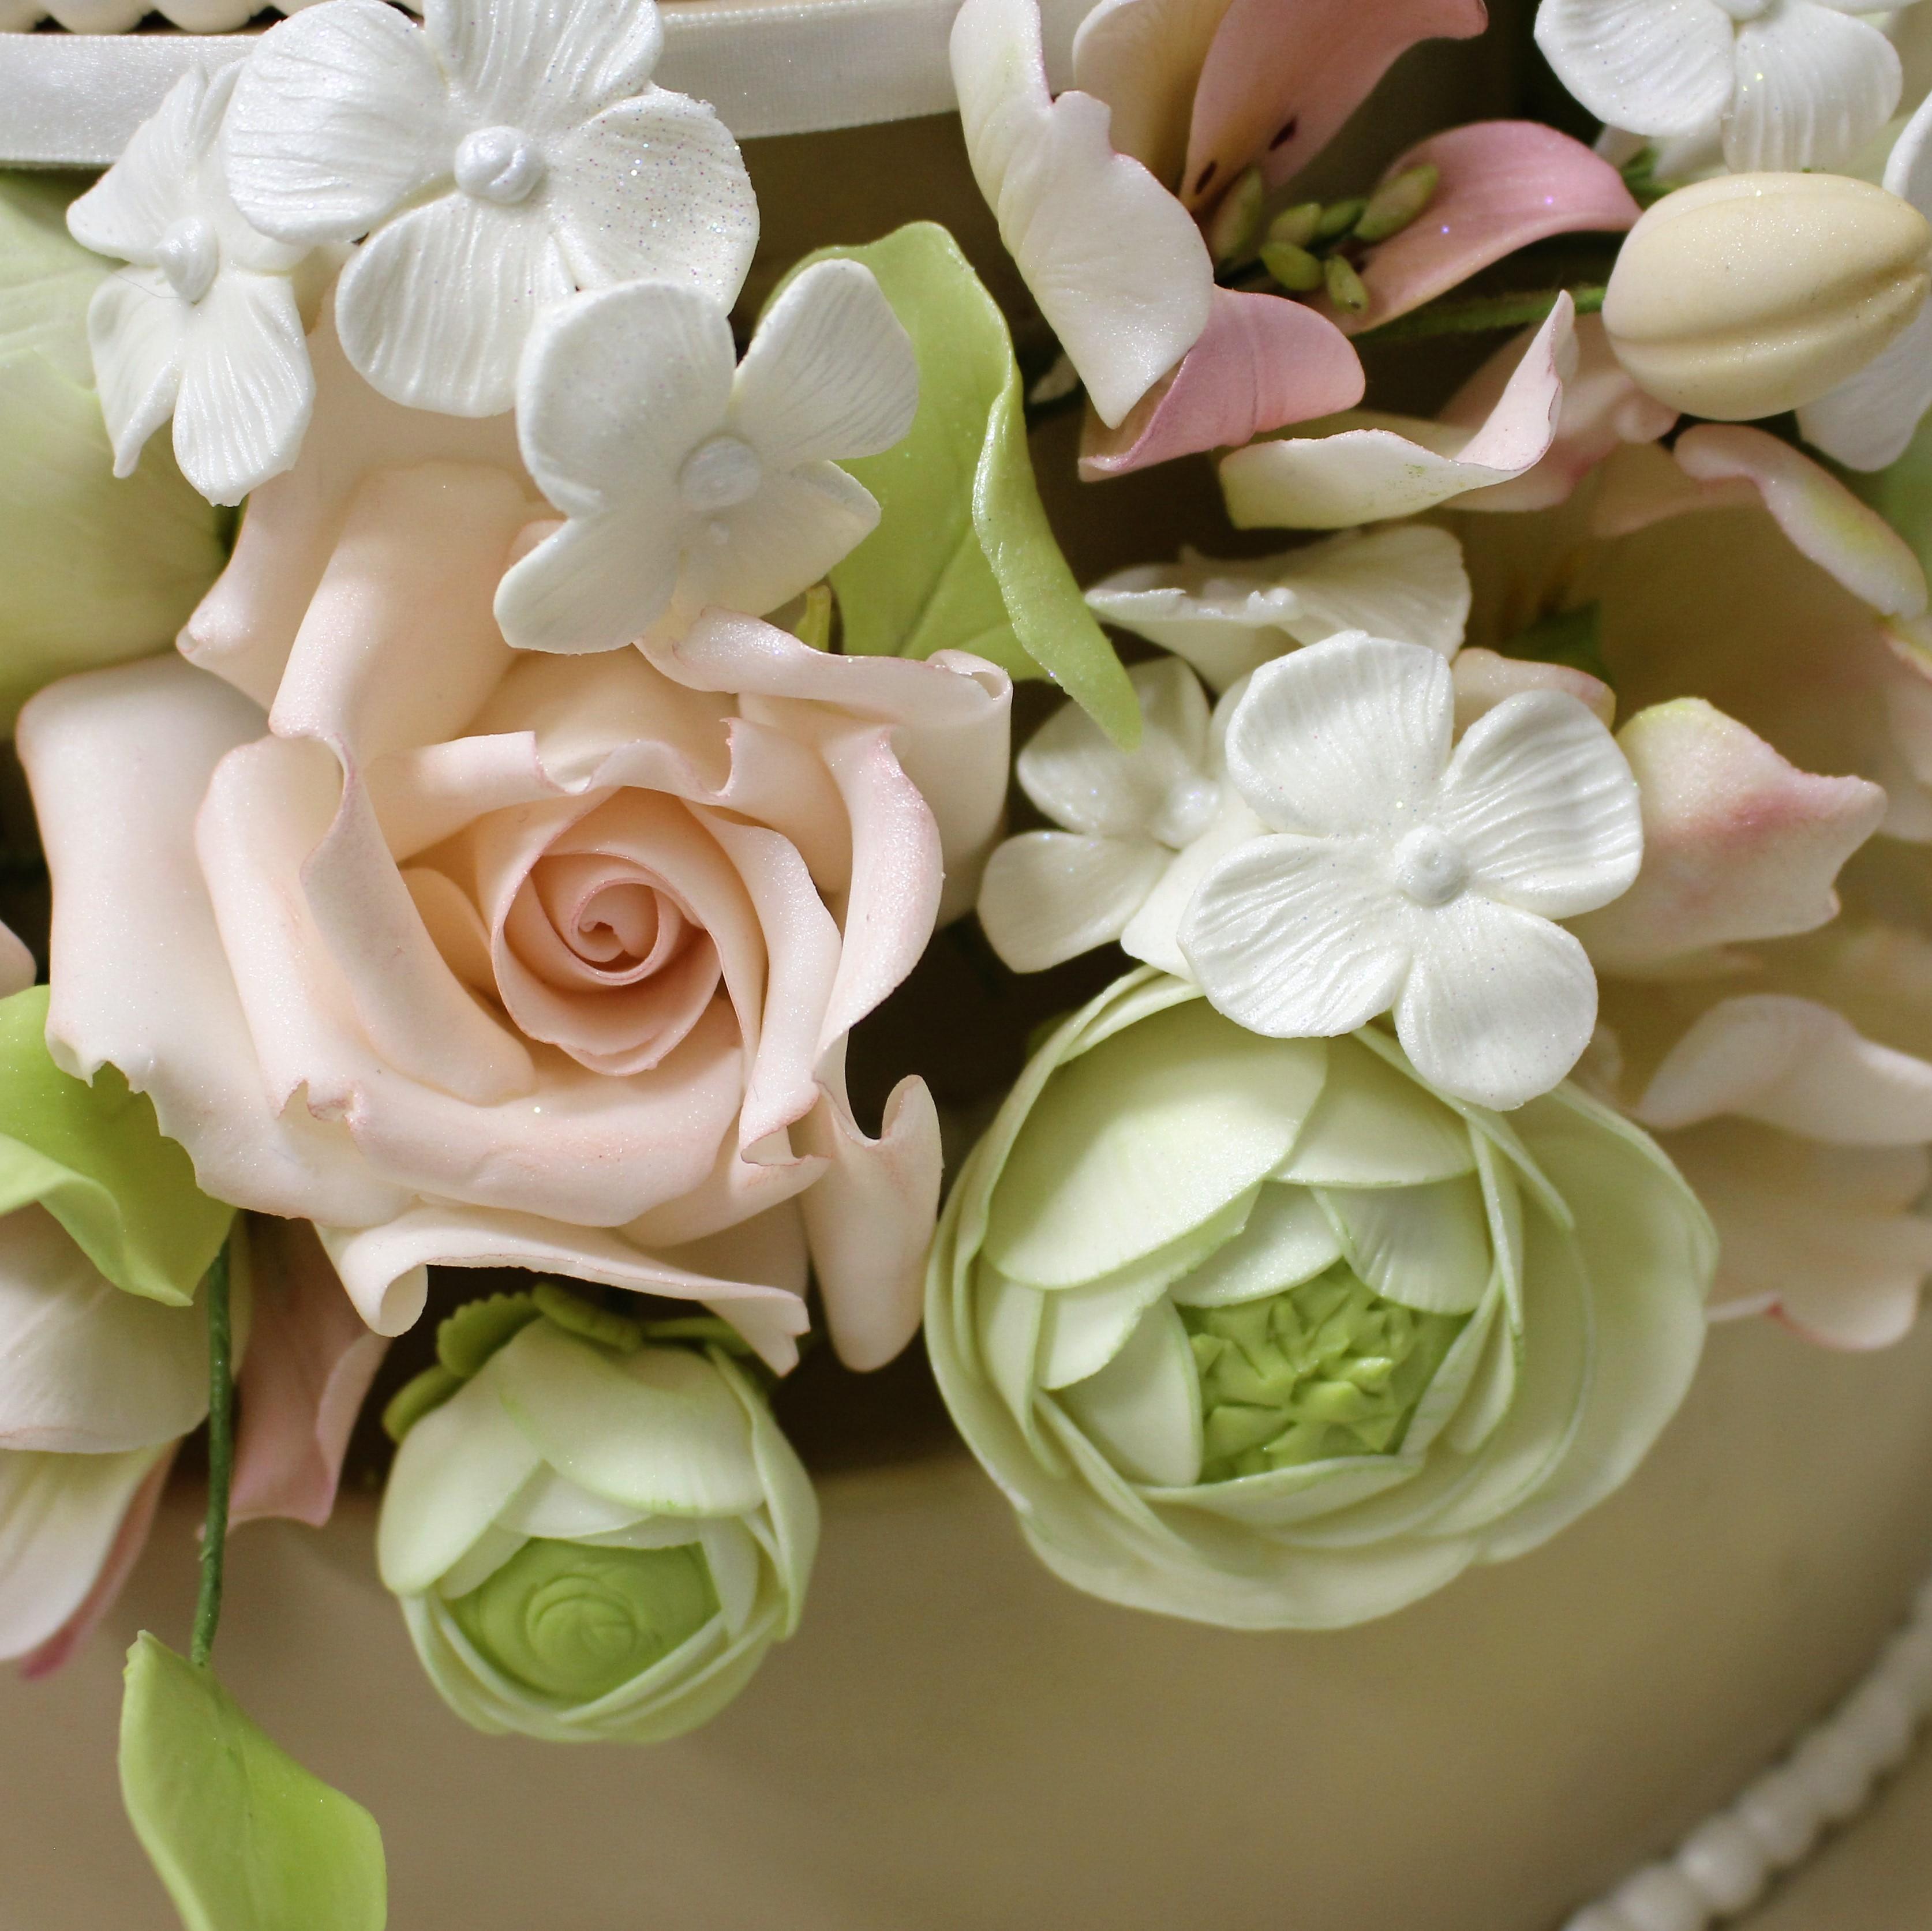 Masha-Lipkovsky-Unik-Cakes-Sugar-Flowers.JPG#asset:16131